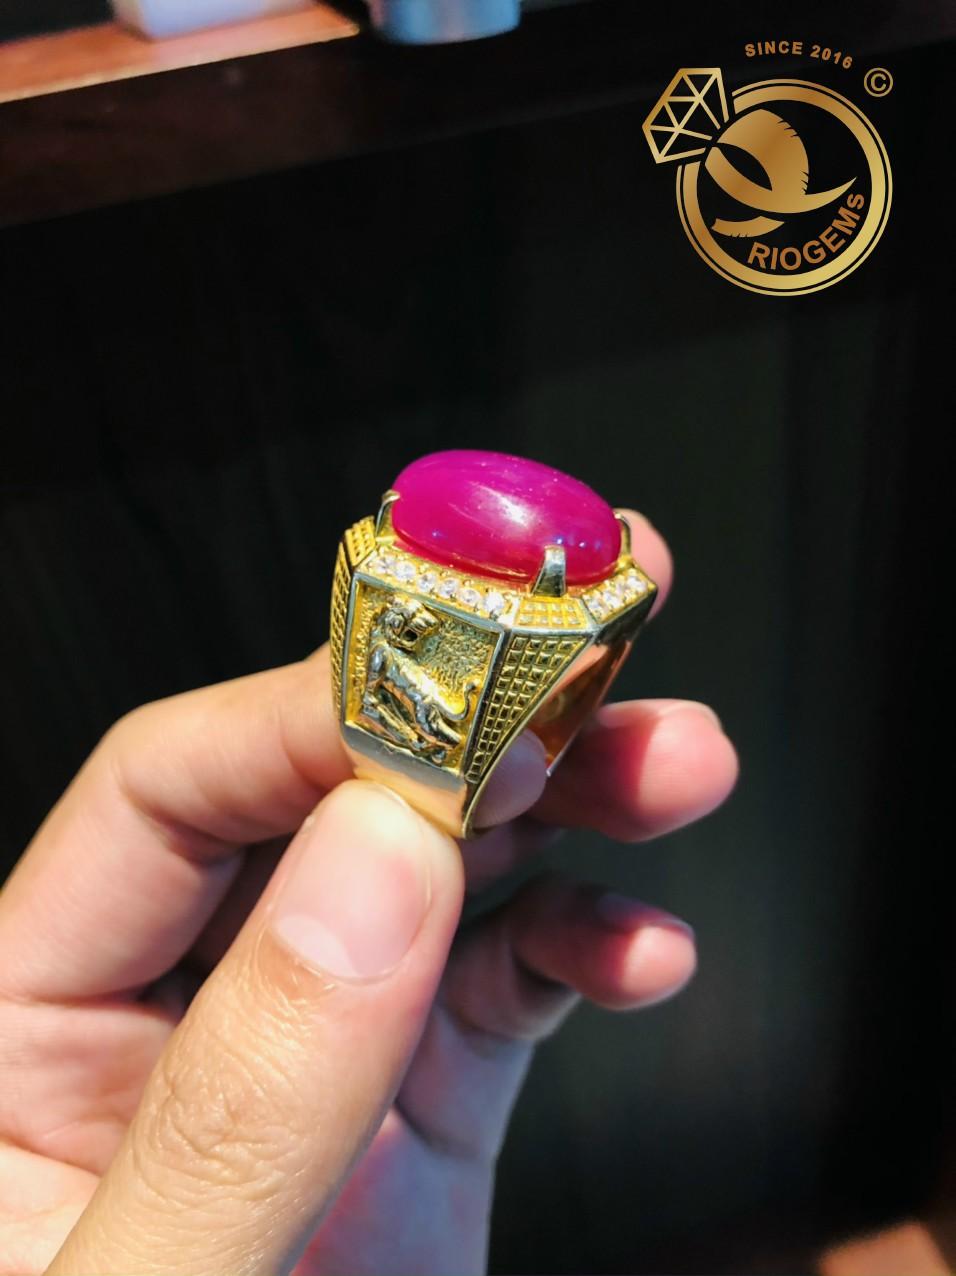 Nhan-nam-vang-dinh-Ruby-Riogems